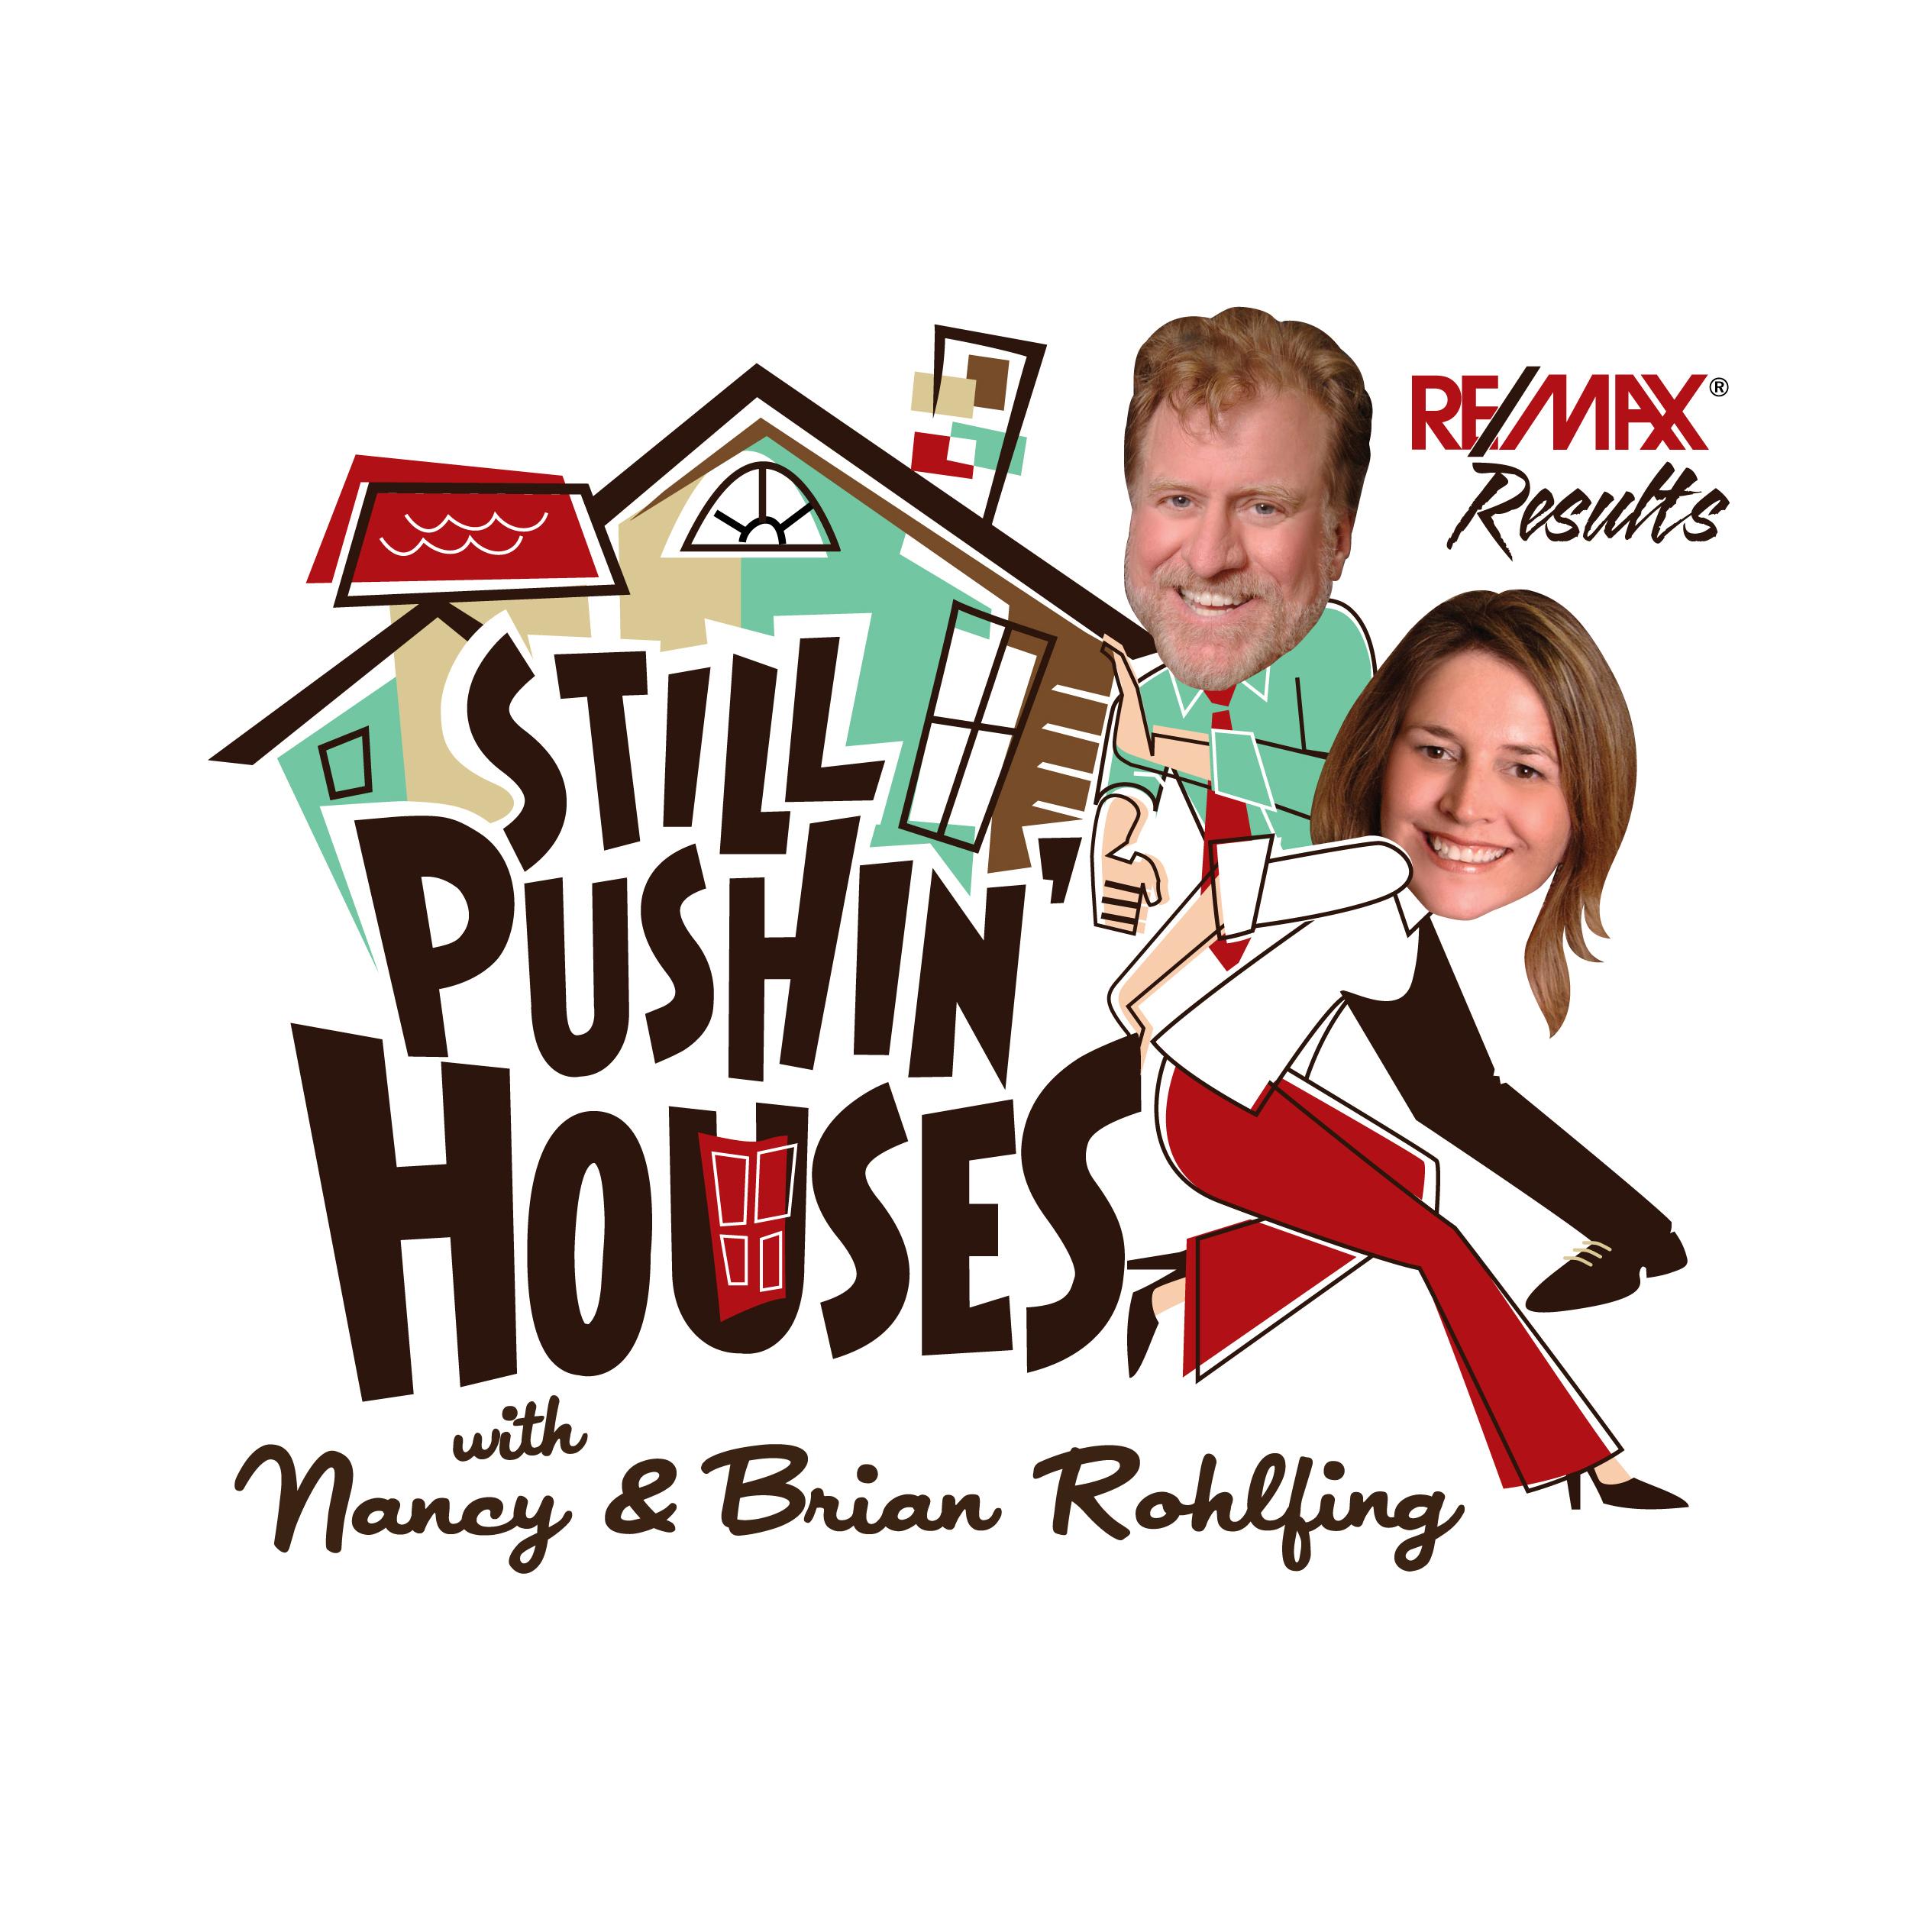 Rohlfing Logo Pusin houses